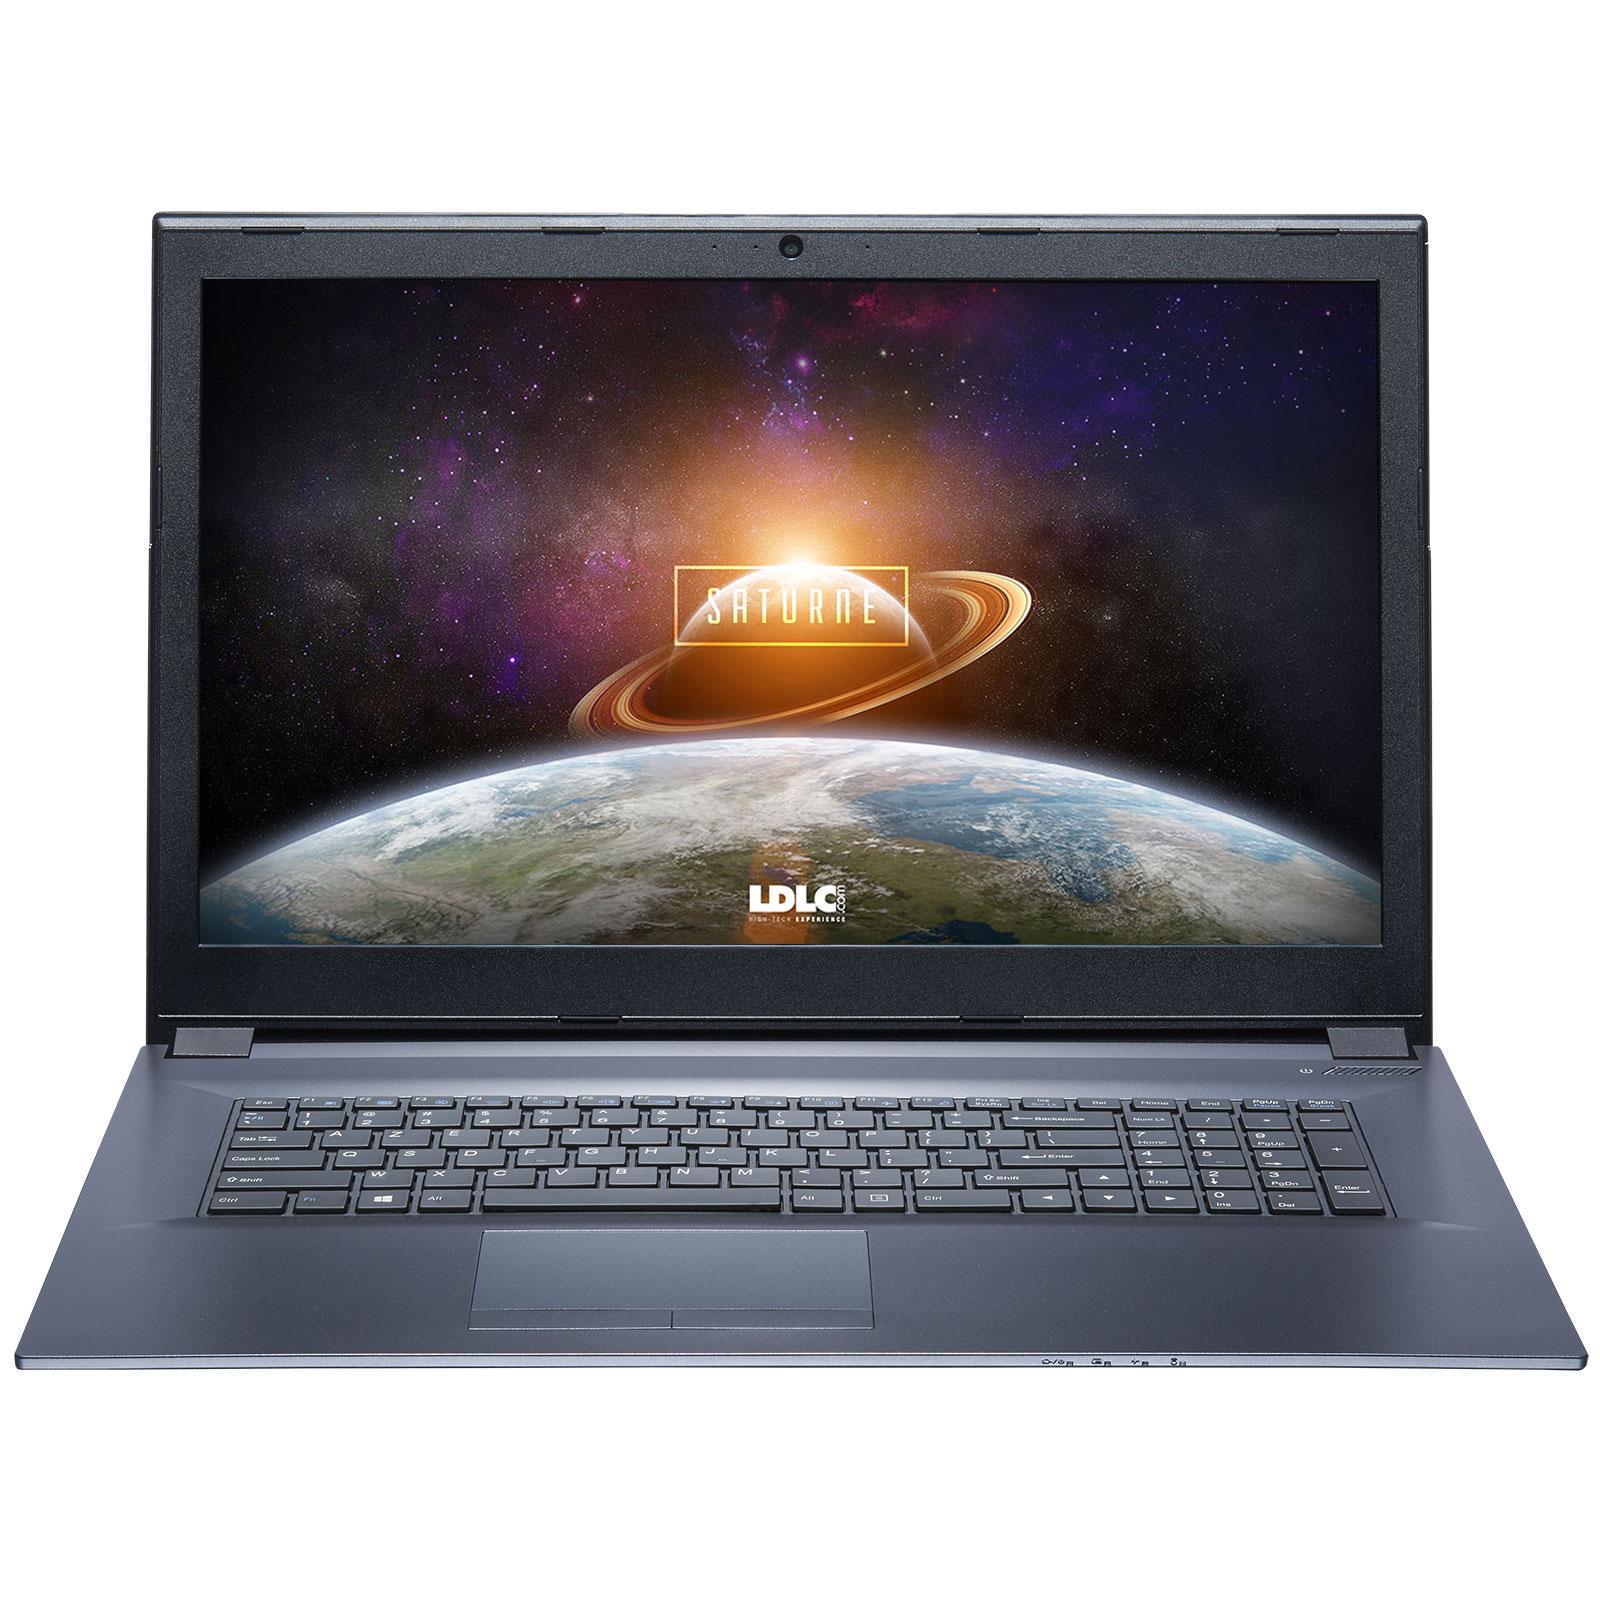 "PC portable LDLC Saturne AK51B-I5-8-H10S2 Intel Core i5-7300HQ 8 Go SSD 240 Go + HDD 1 To 17.3"" LED Full HD NVIDIA GeForce GTX 1050 4 Go Wi-Fi AC/Bluetooth Webcam (sans OS)"